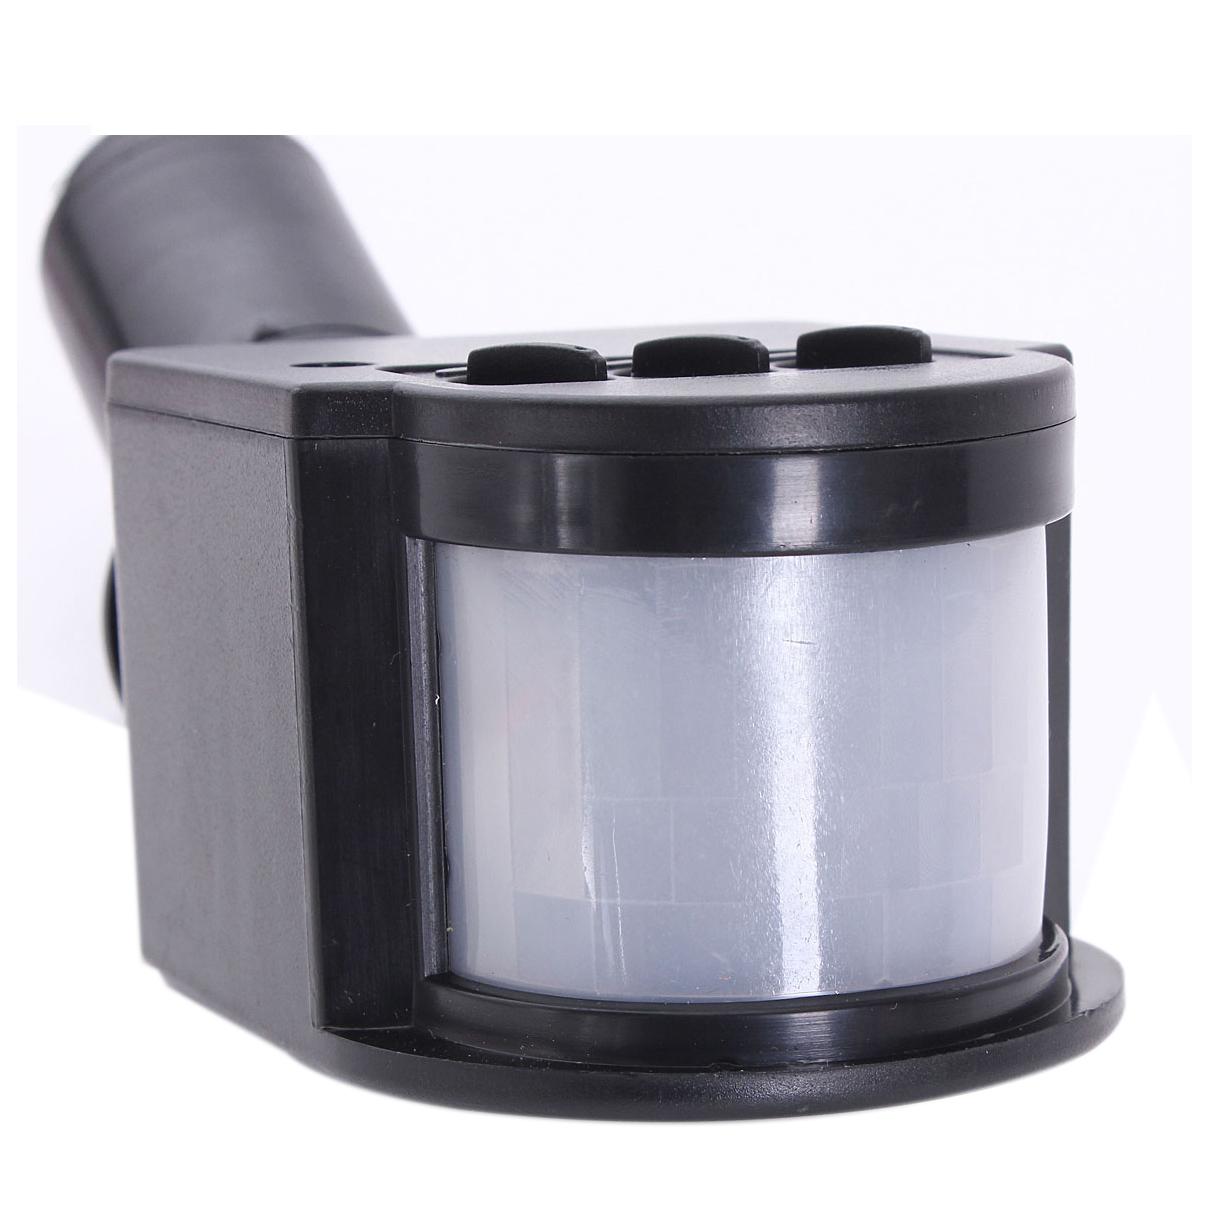 Outdoor Wall Light Sensor: LED Security Light Infrared PIR Motion Sensor Detector